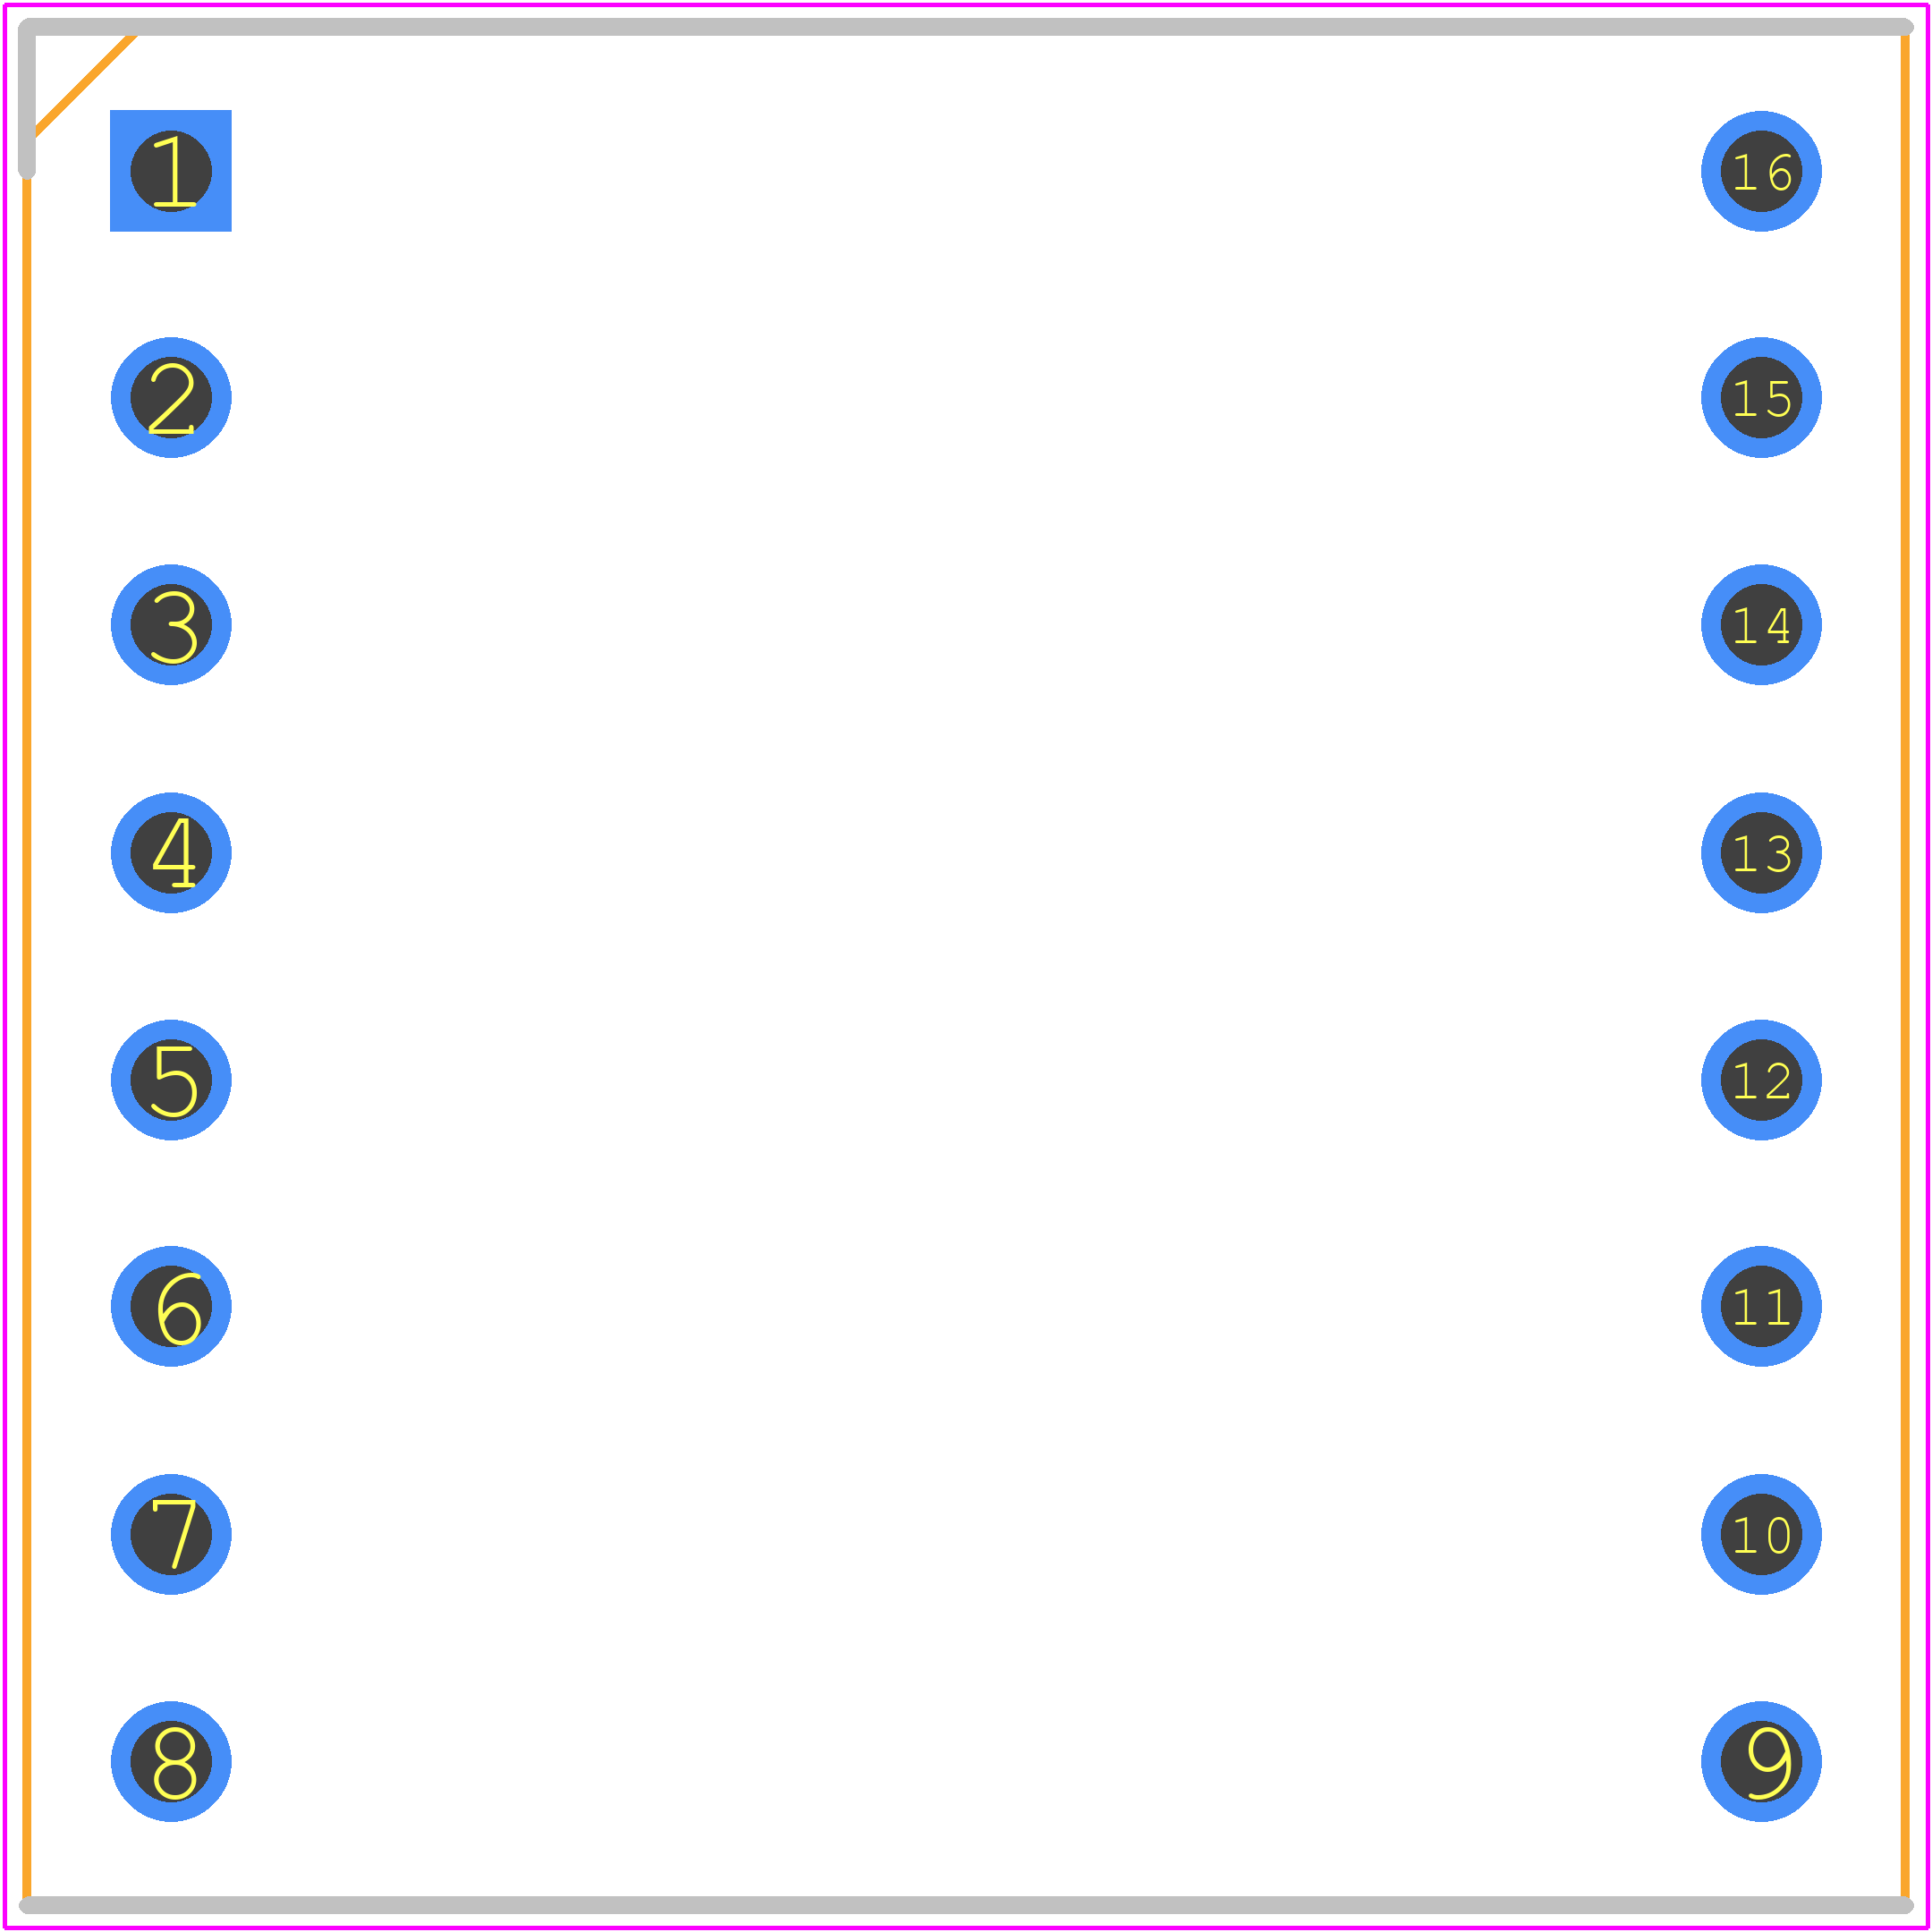 DFR0299 - DFRobot PCB footprint - Dual-In-Line Sockets - MP3-TF-16P